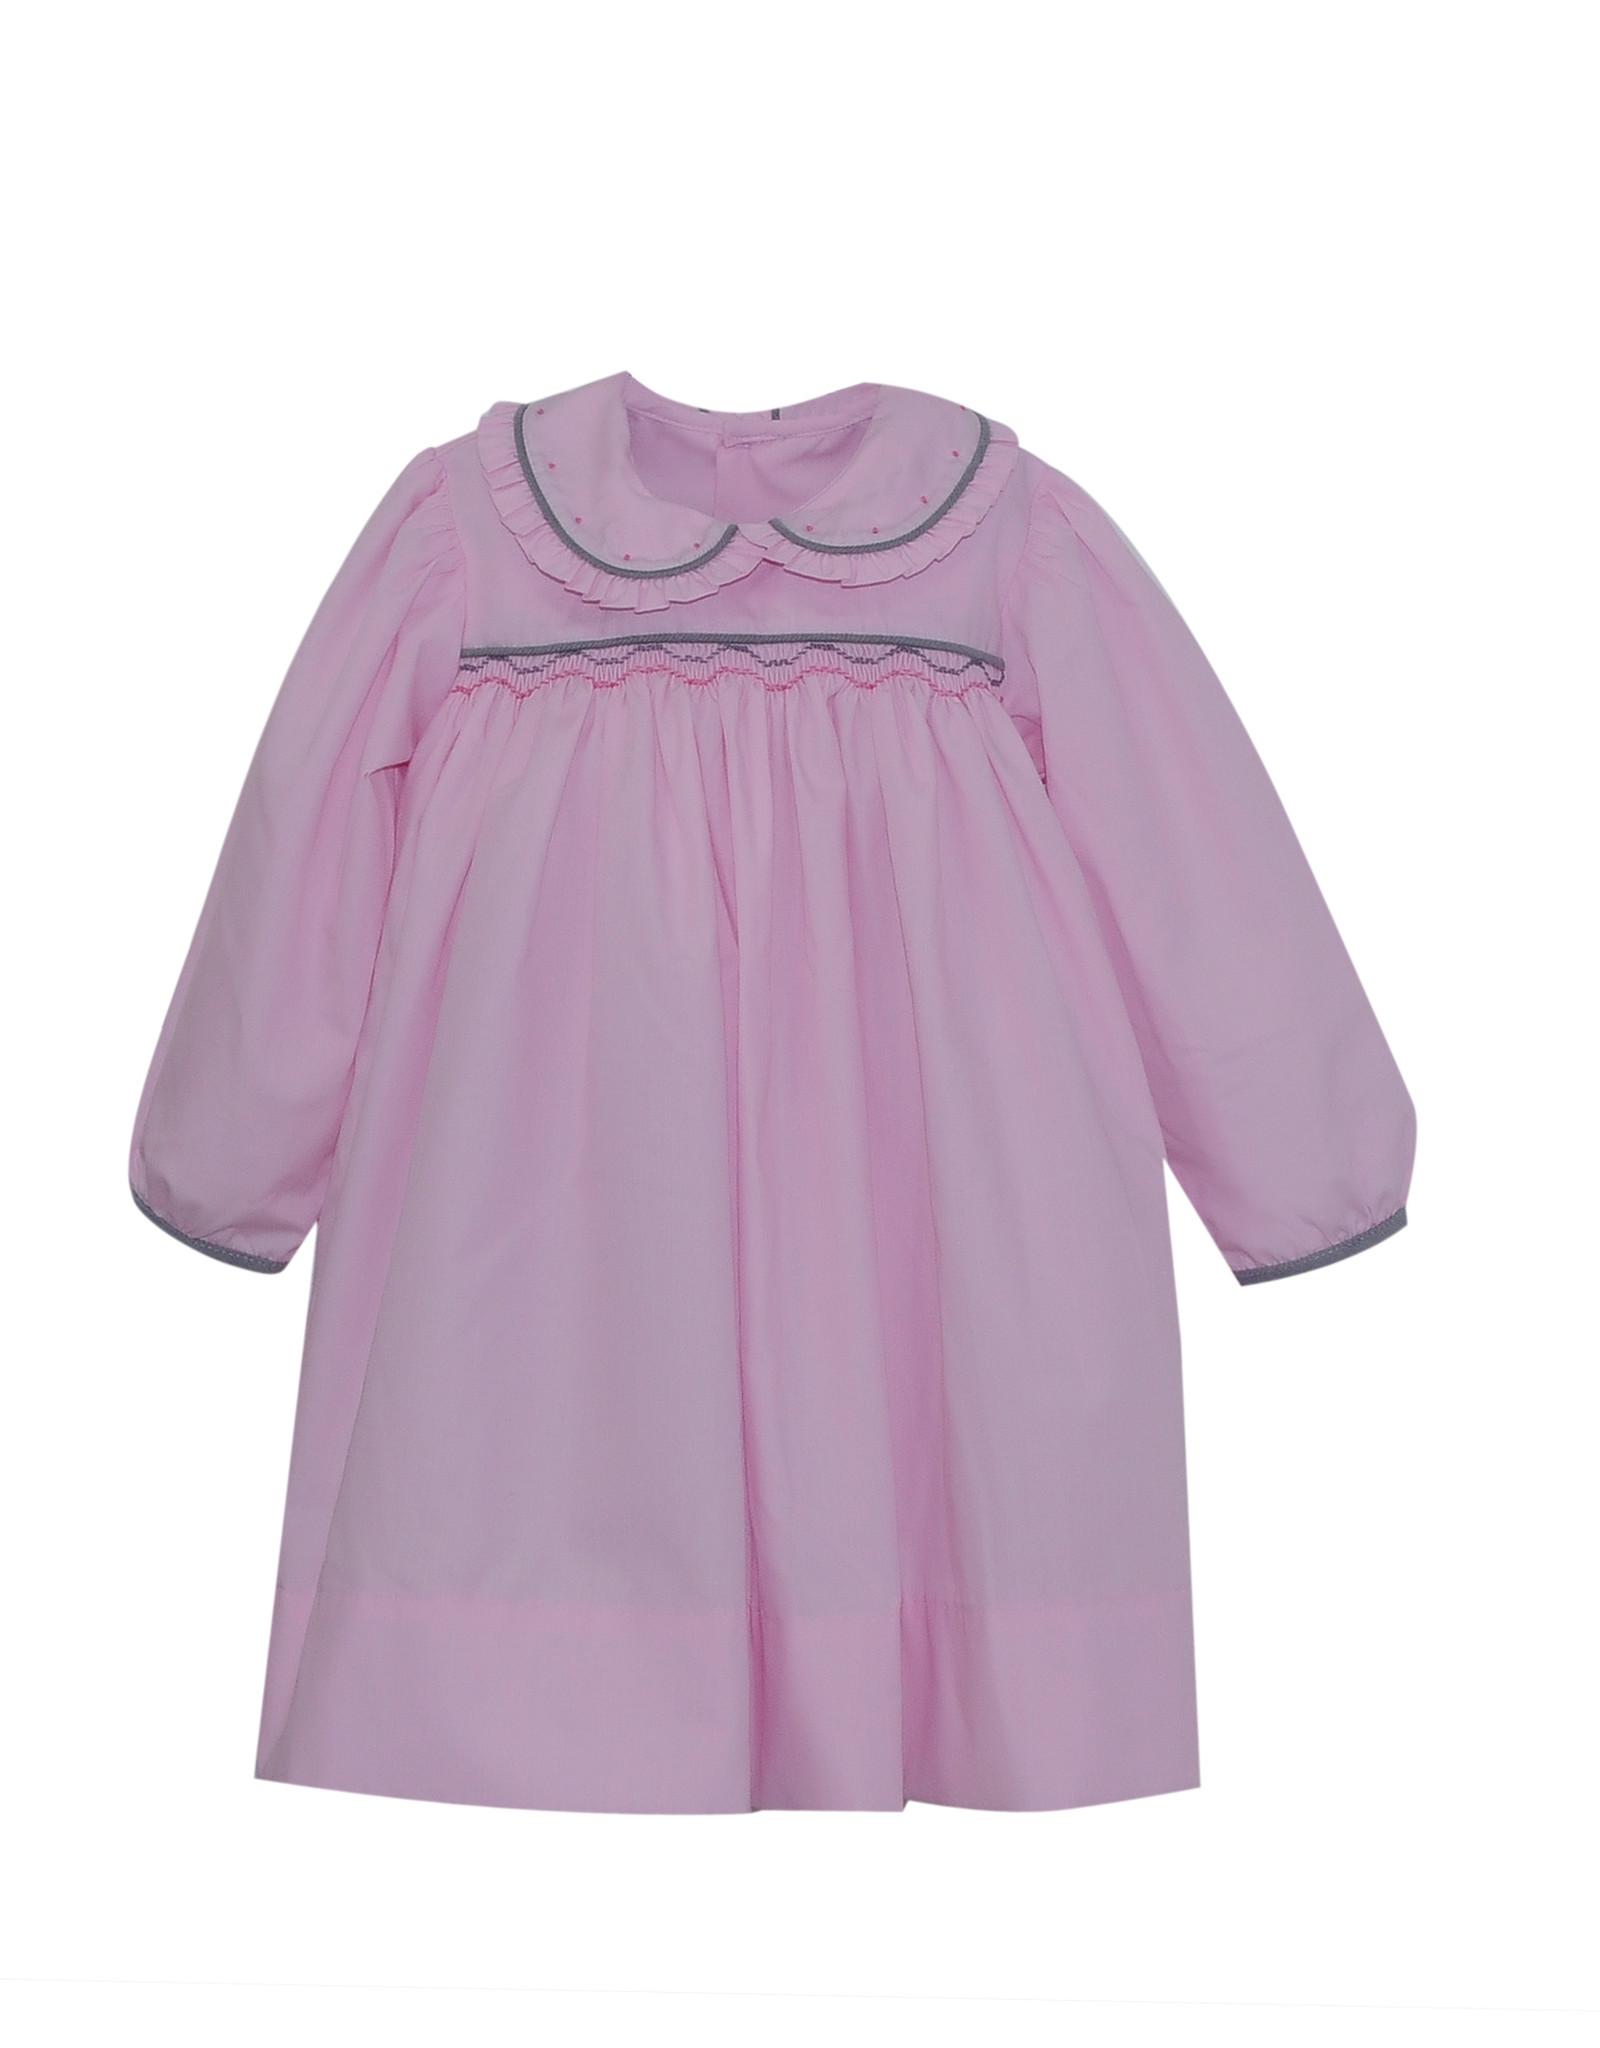 LullabySet Pink And Grey Memory Making Dress